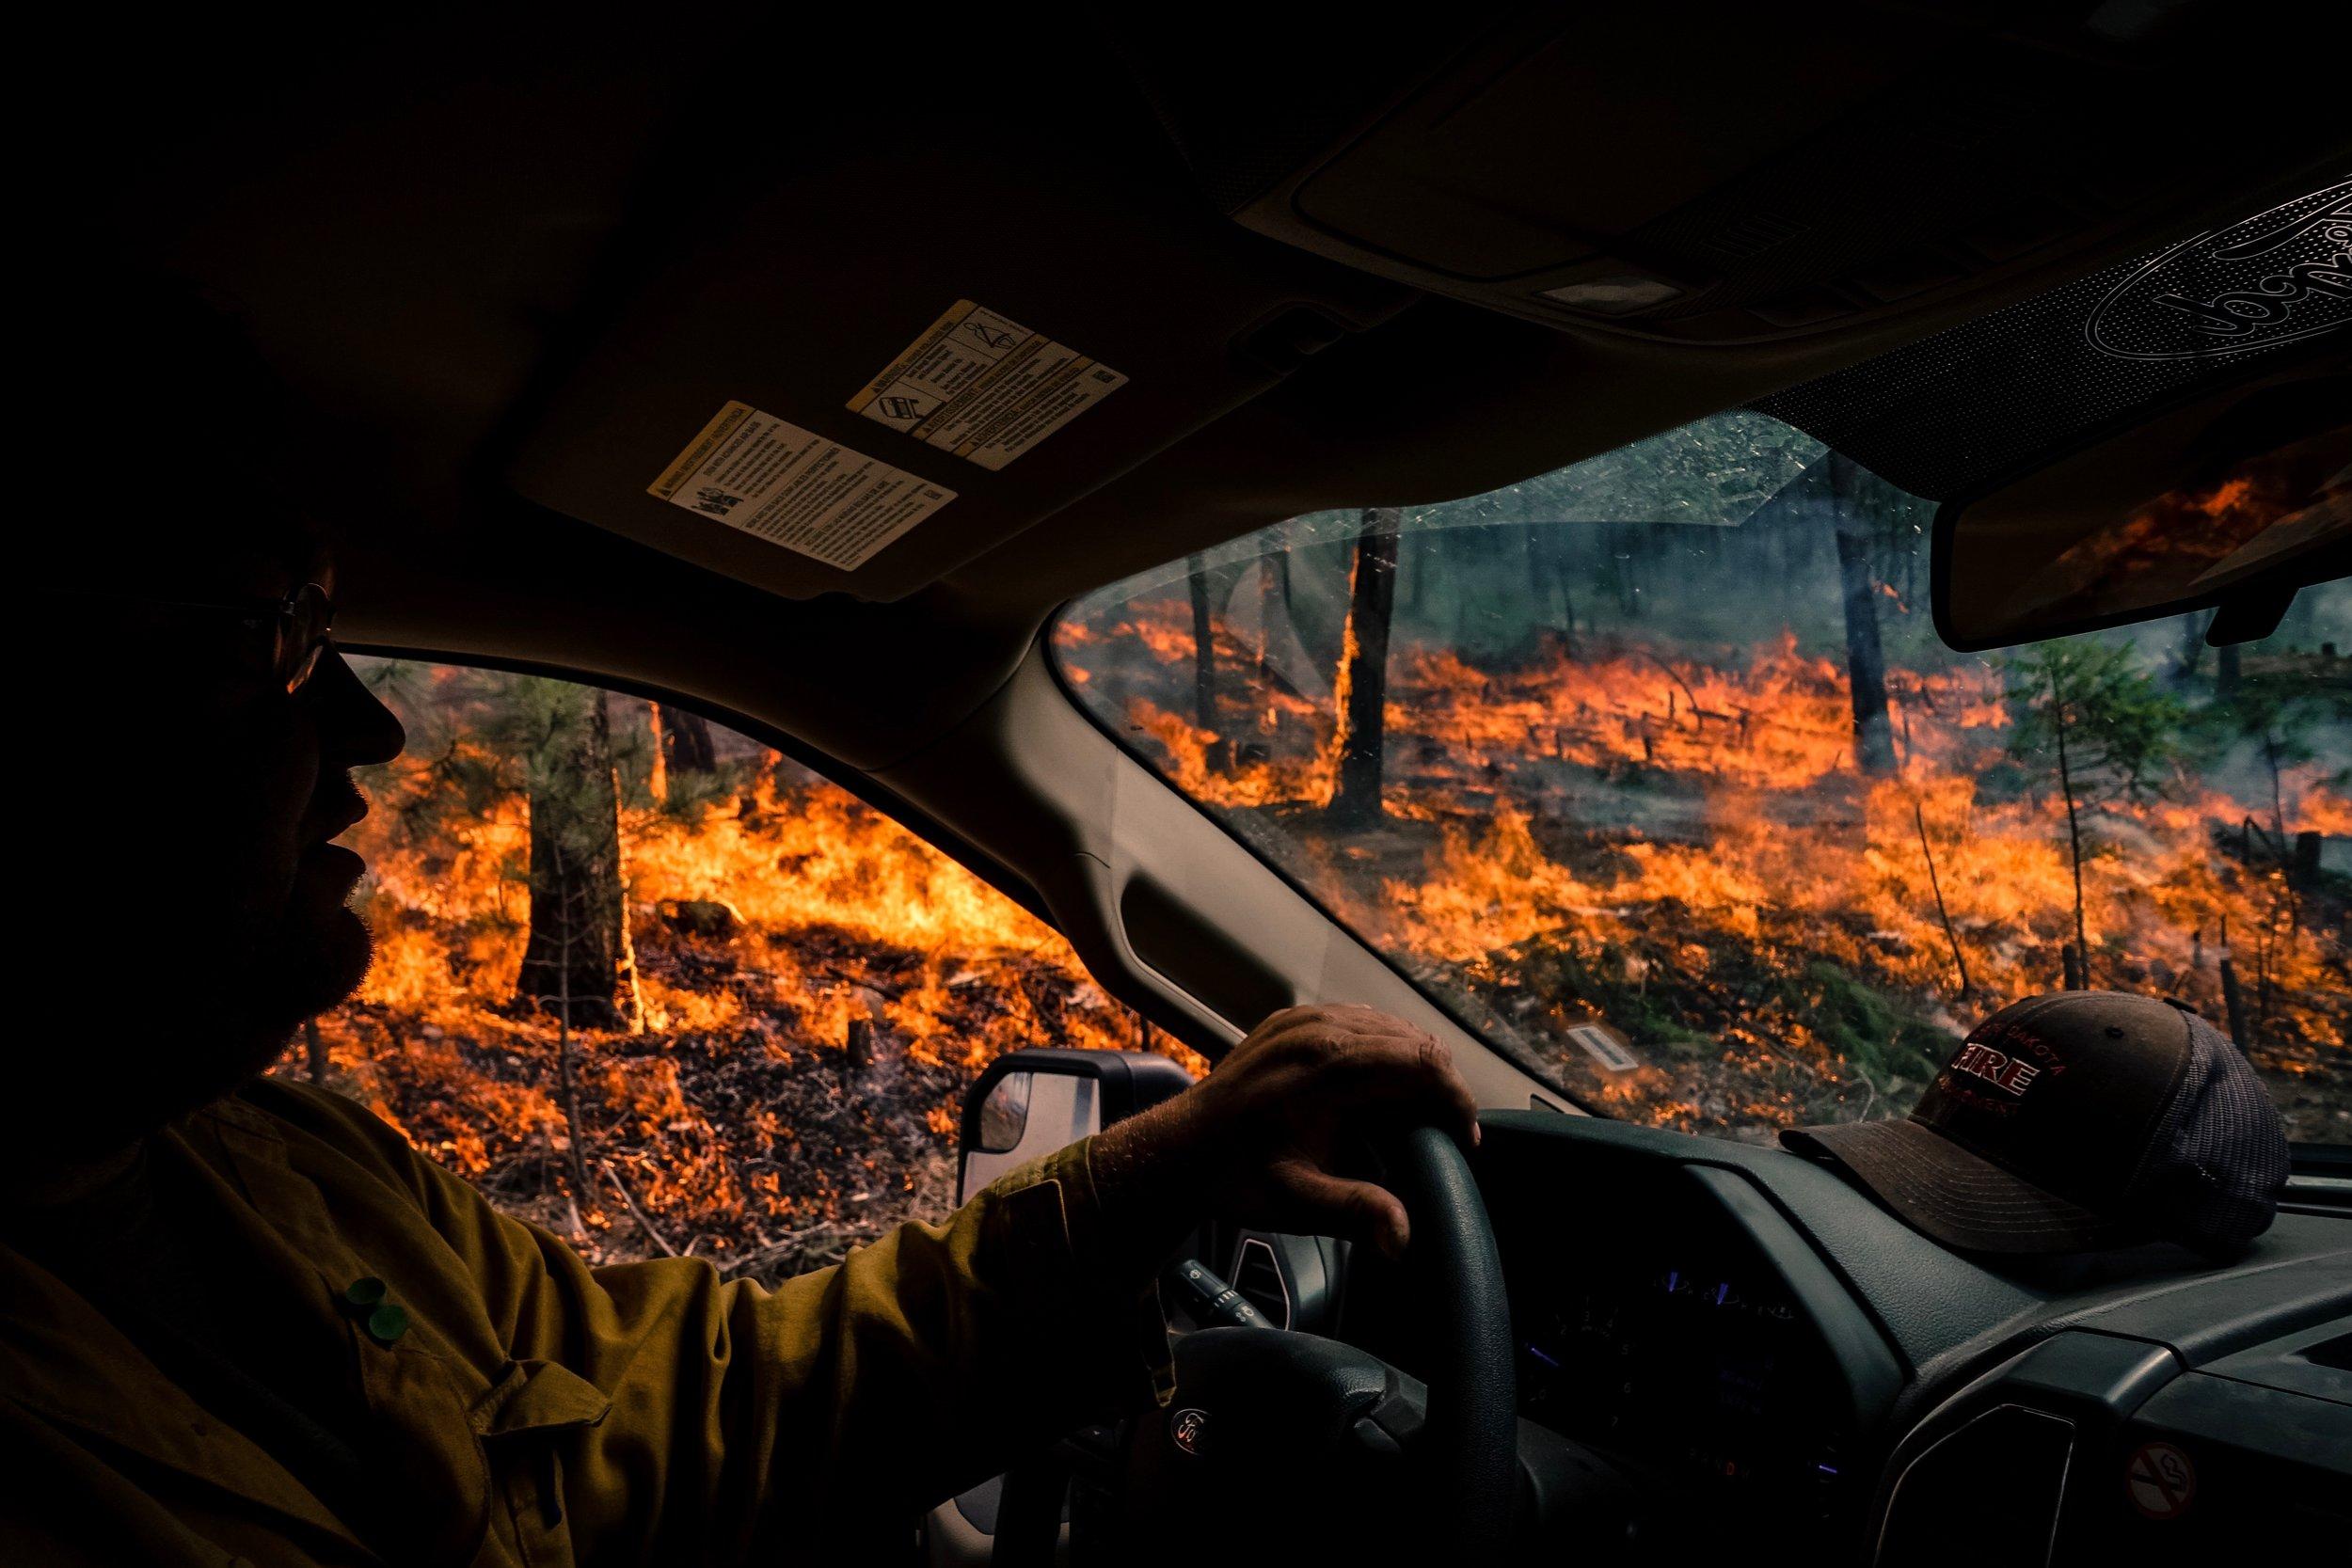 Robert LeBlanc_ Forest Fire image 7.jpg